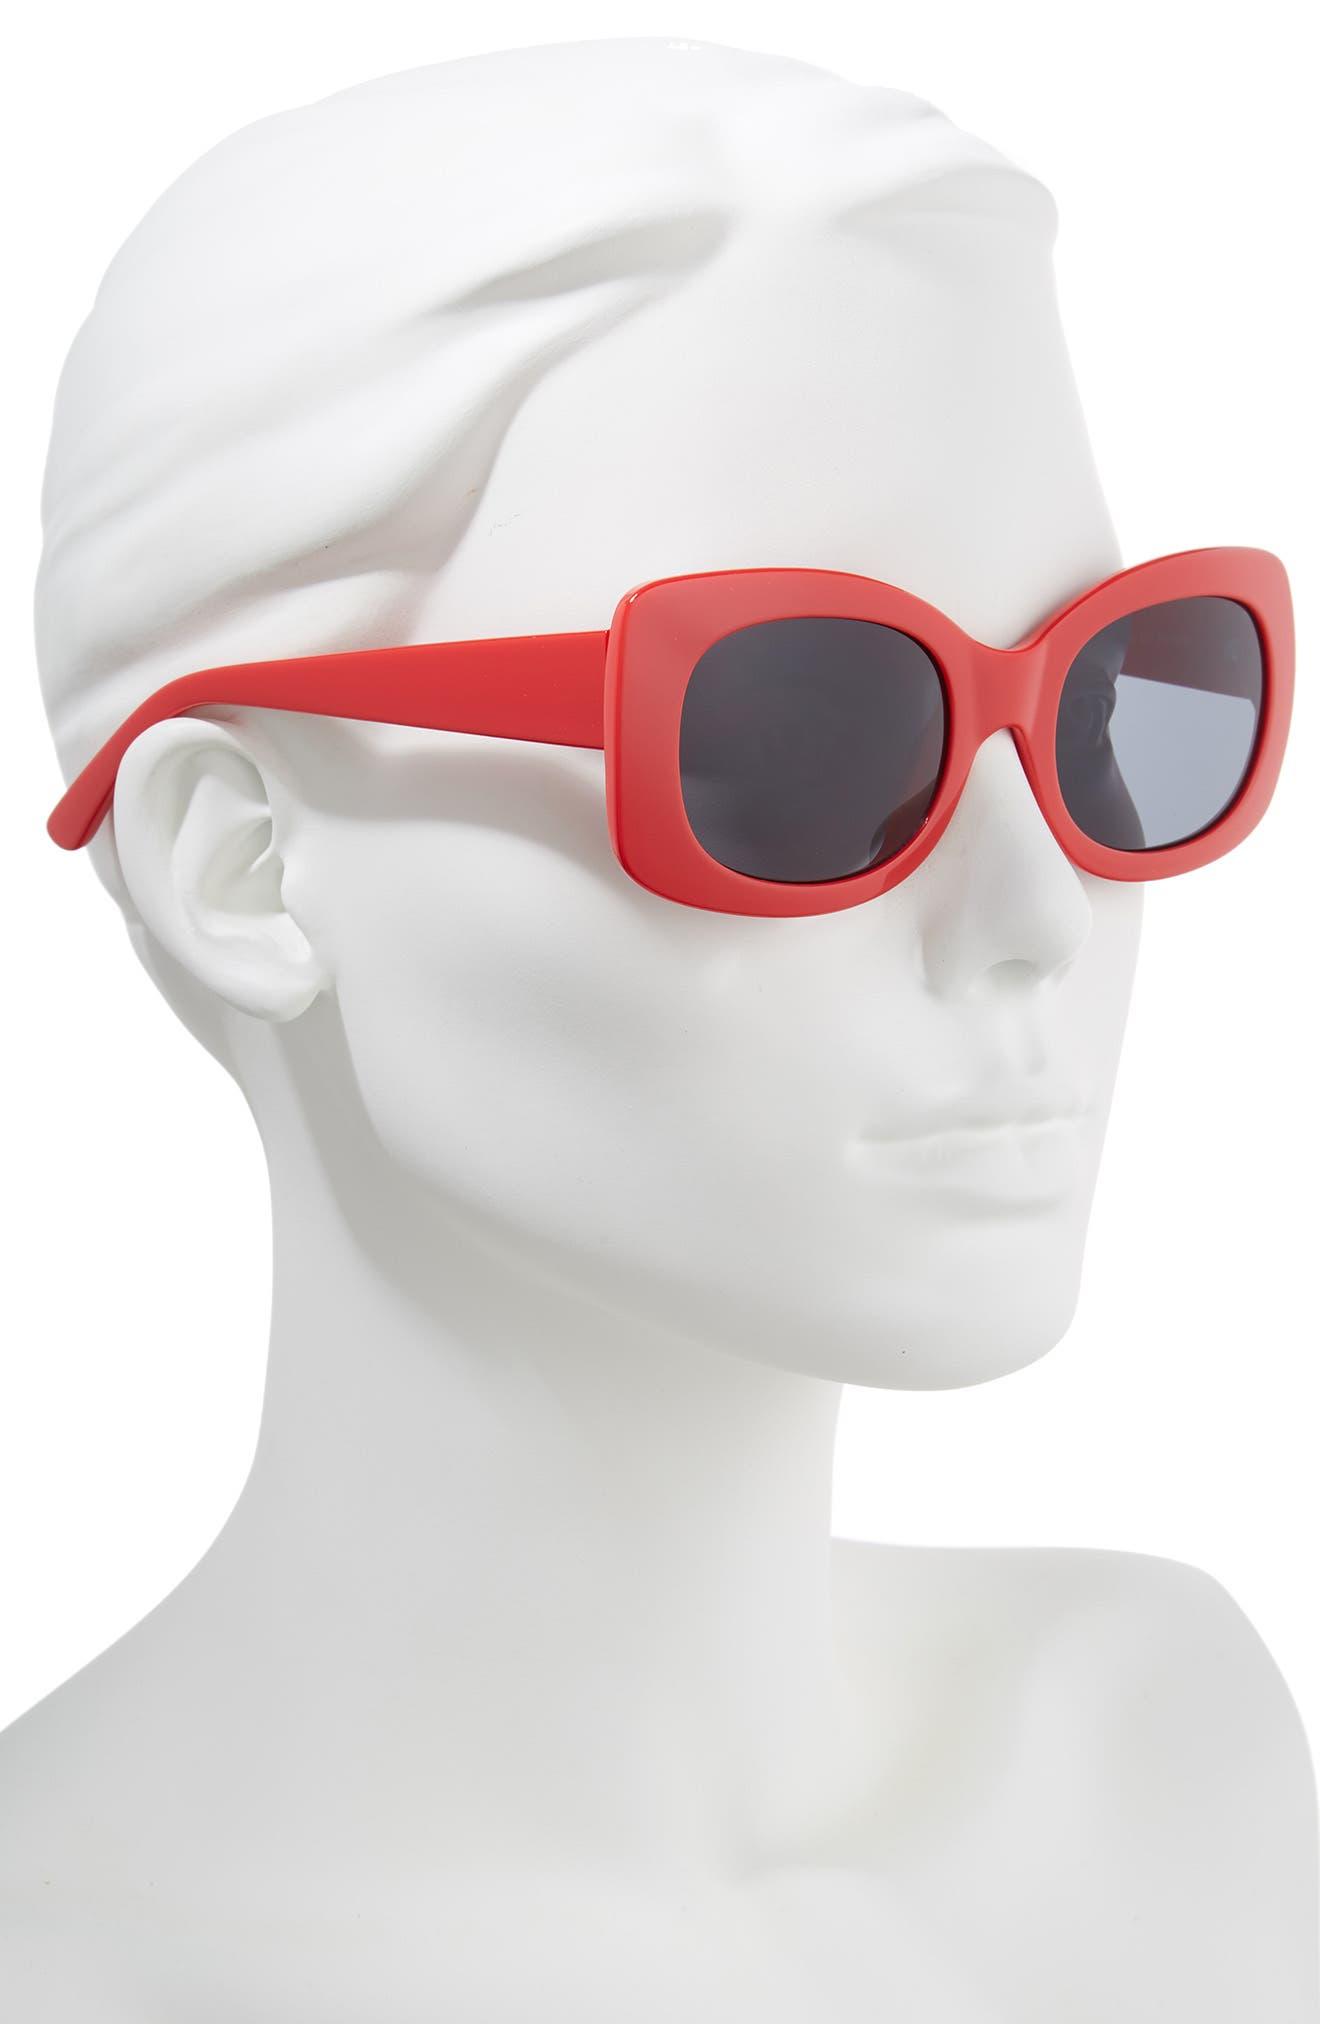 51mm Square Sunglasses,                             Alternate thumbnail 2, color,                             Red/ Black